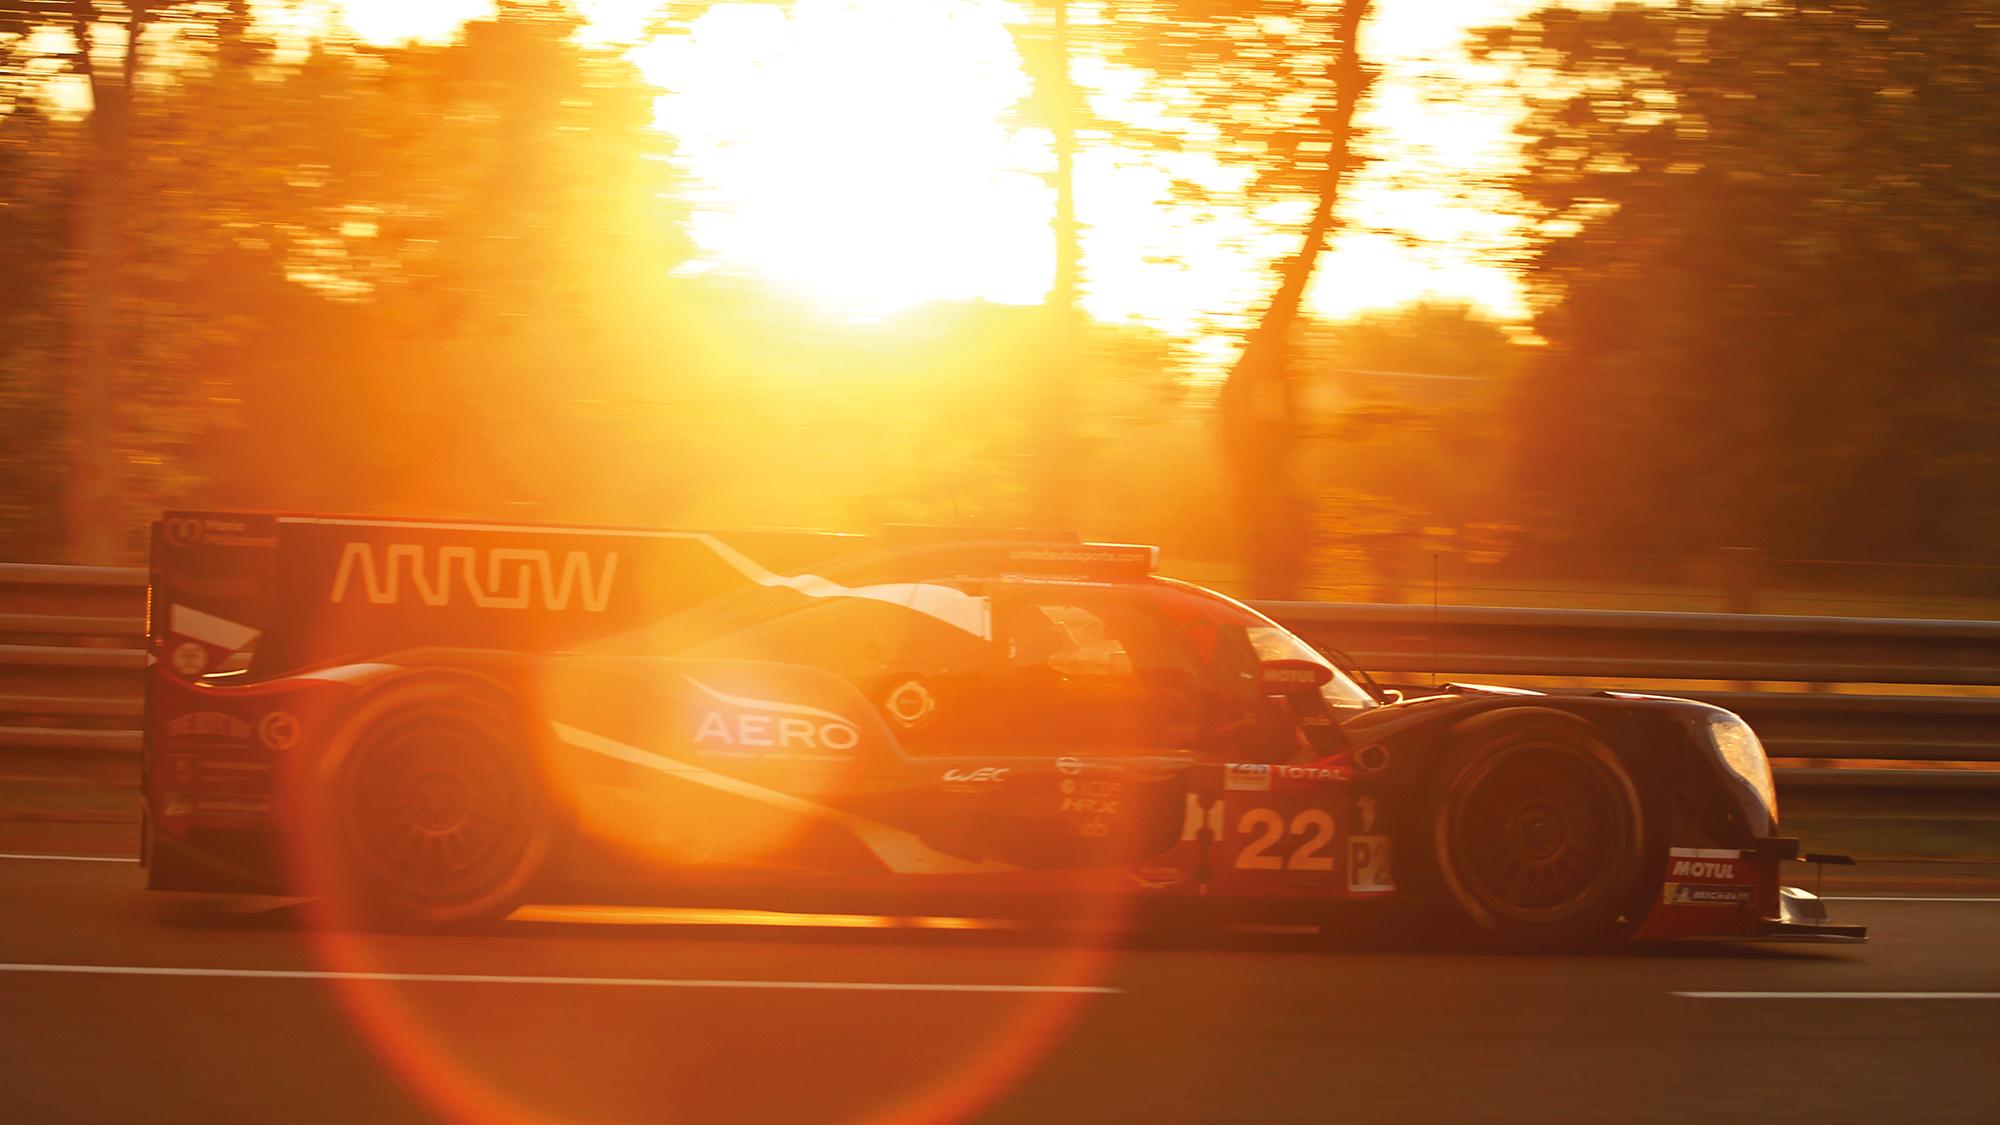 vUnited Autosports LMP2 car at Le Mans